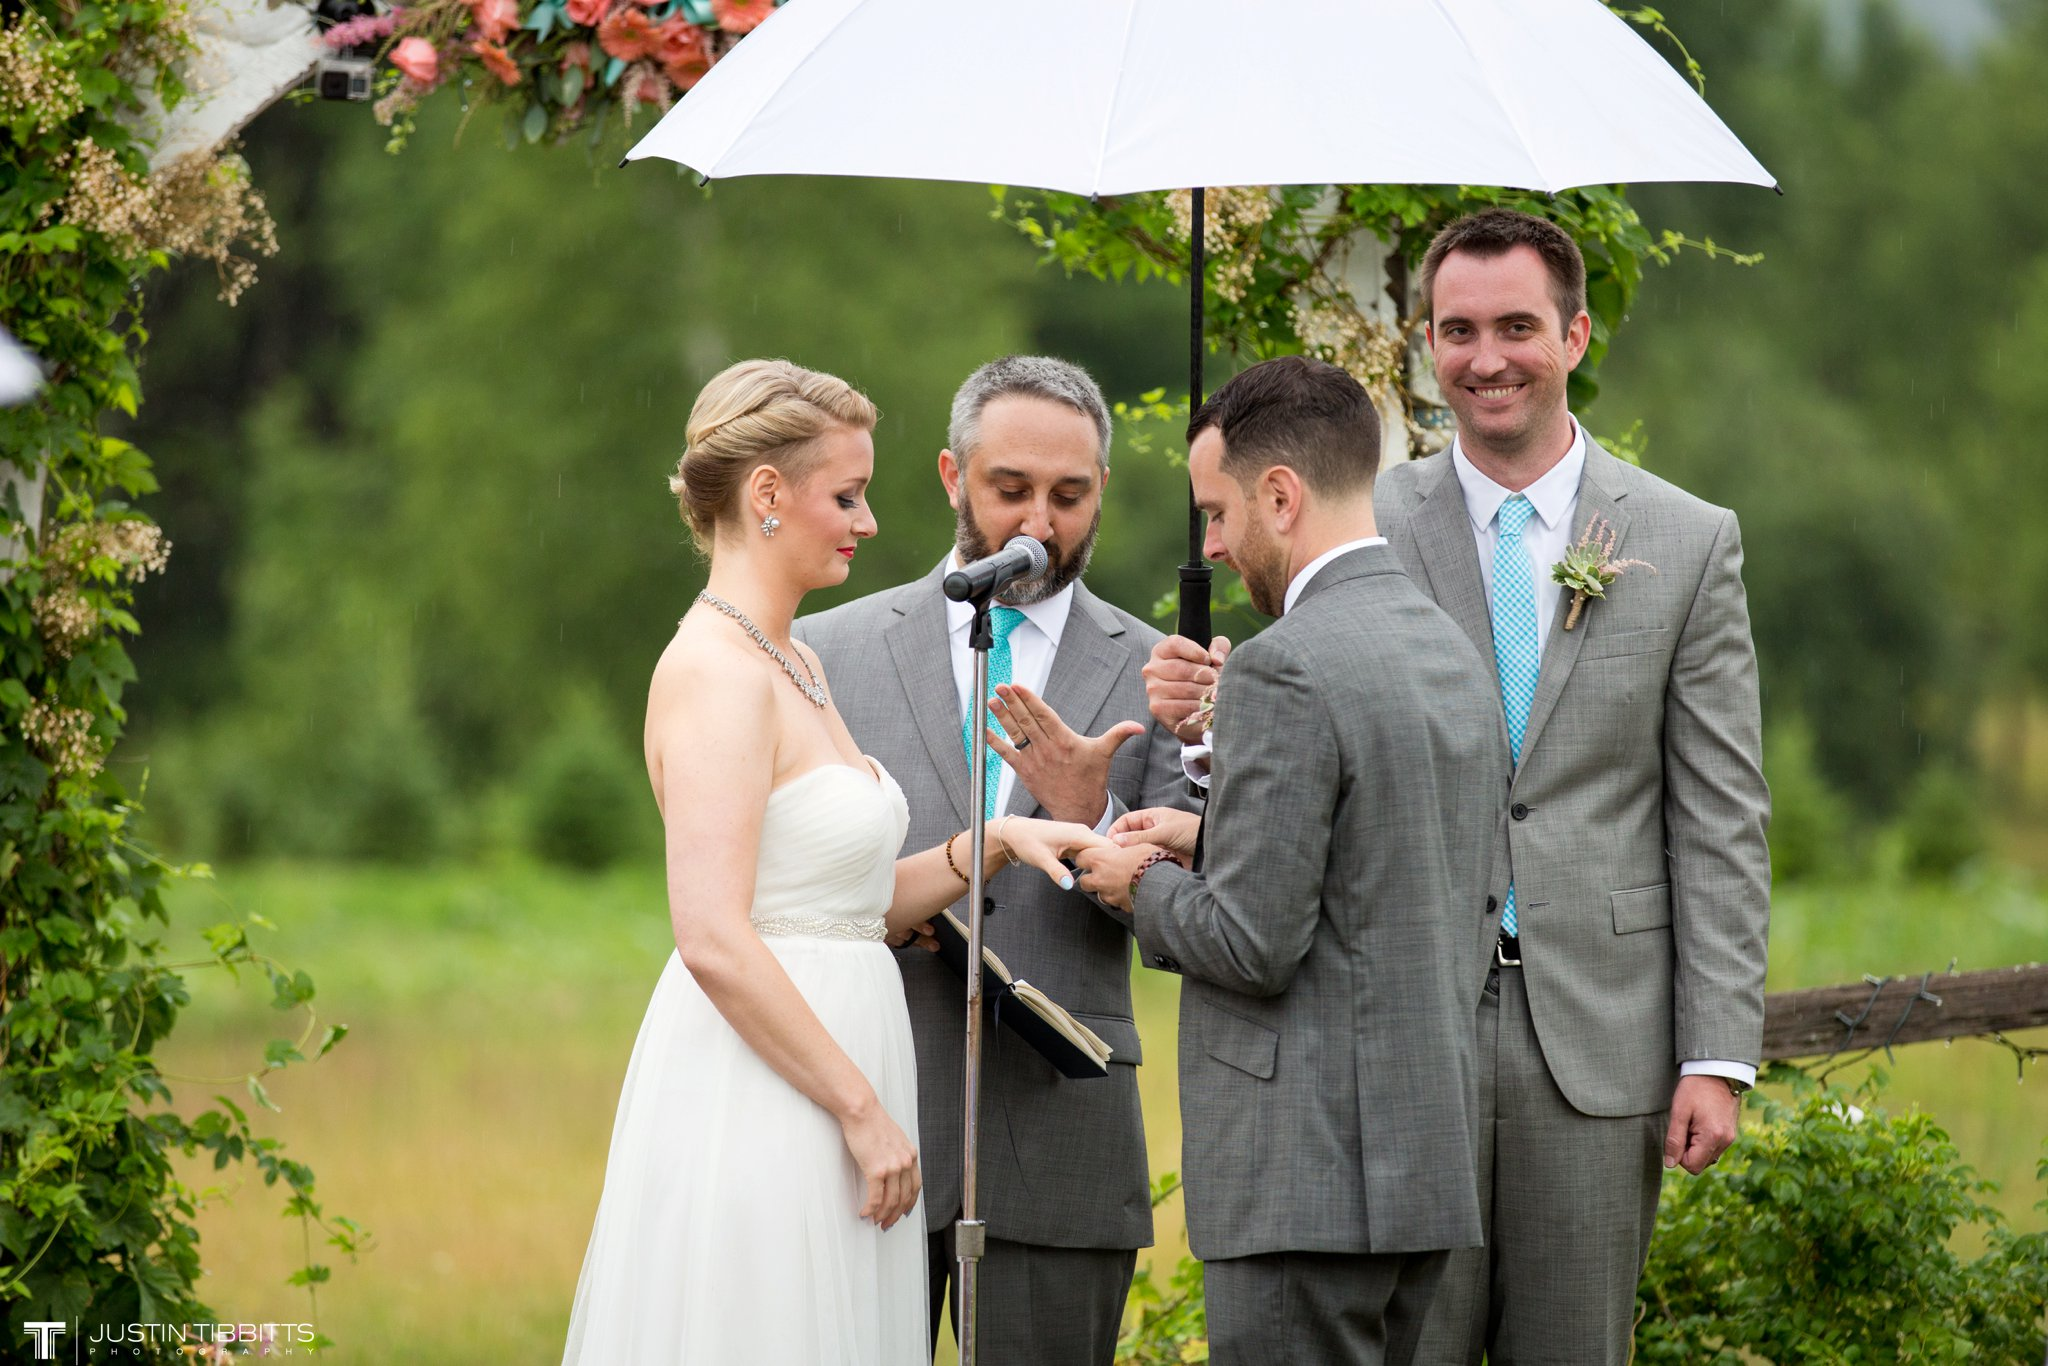 burlap-and-beams-wedding-photos-with-joran-and-molly_0071